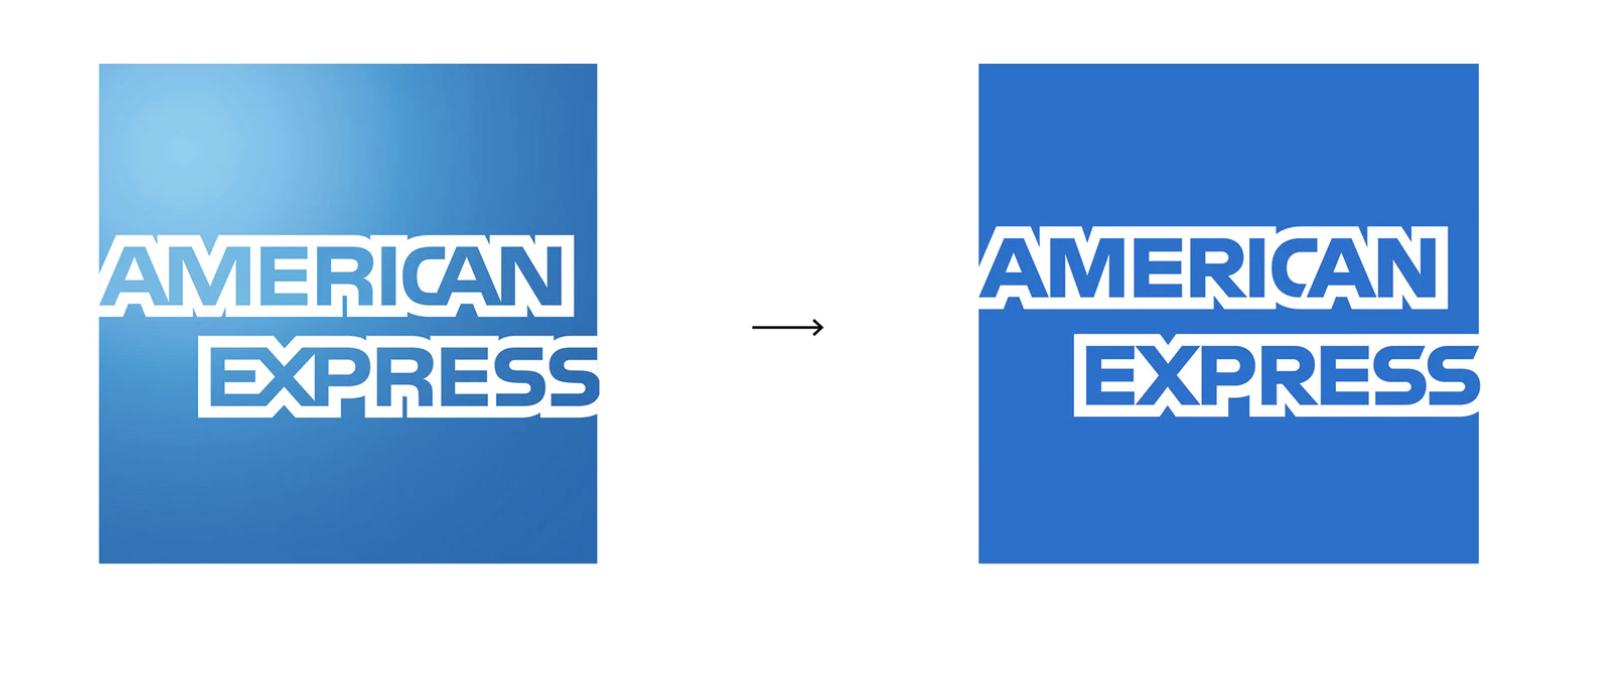 Amex changed brand logo